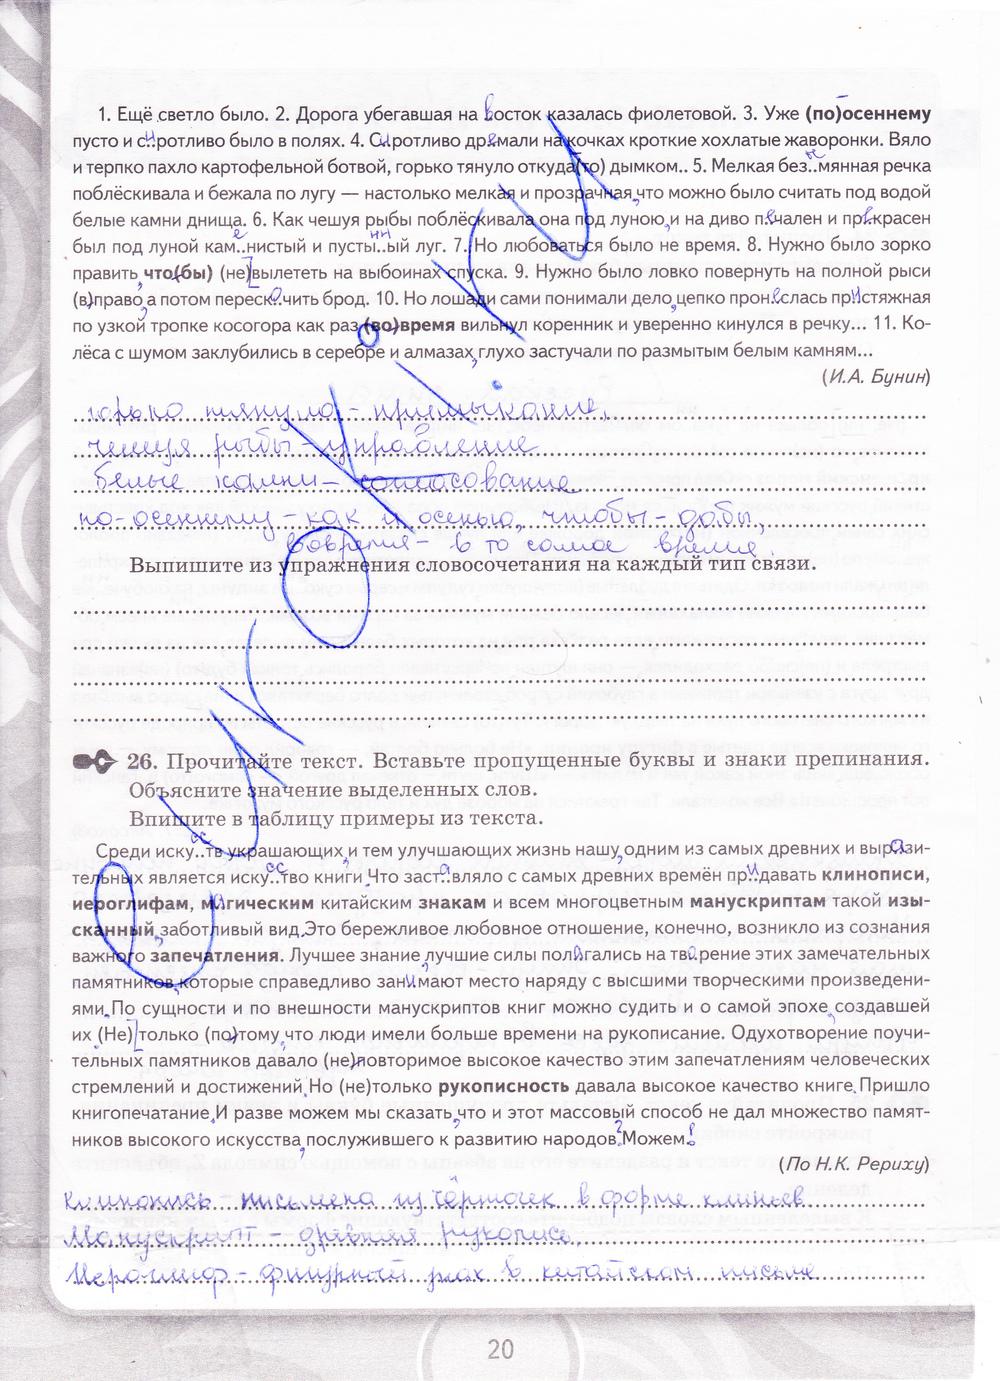 Гдз немецкий язык рабочая тетрадь 8 класс